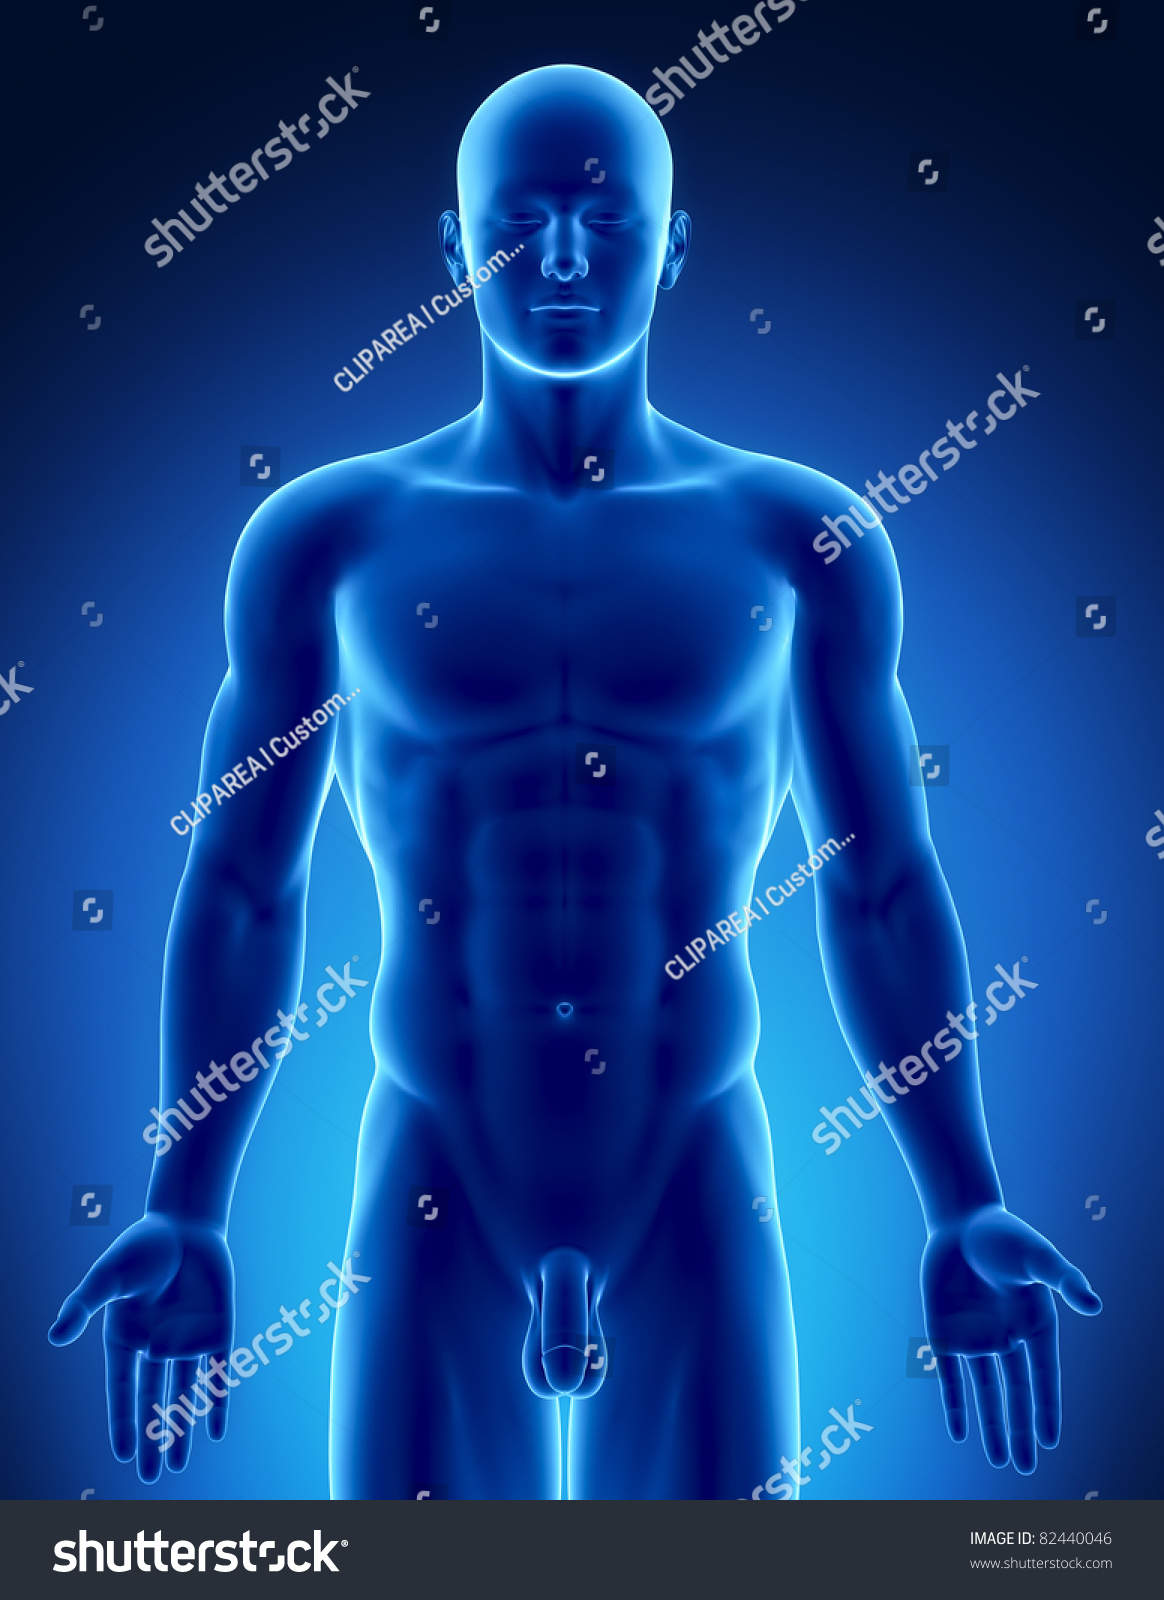 Male Anatomy Human Organs Xray View Stock Illustration 82440046 ...